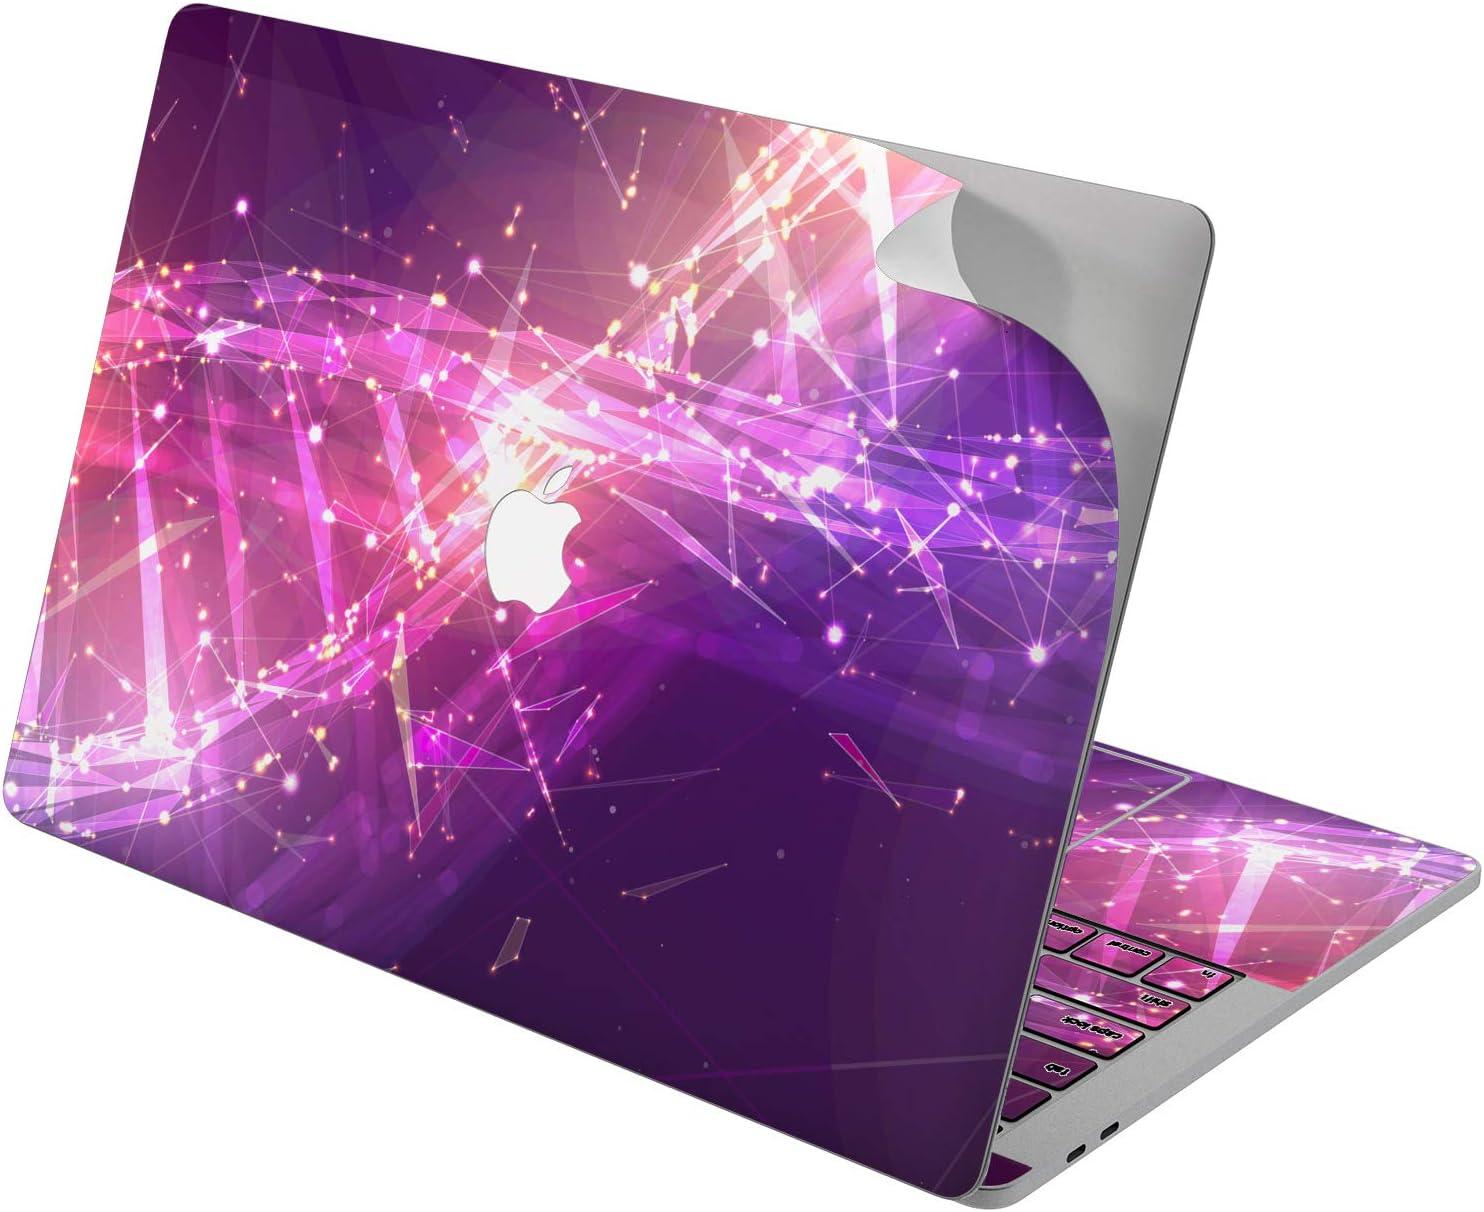 "Cavka Vinyl Decal Skin for Apple MacBook Pro 13"" 2019 15"" 2018 Air 13"" 2020 Retina 2015 Mac 11"" Mac 12"" Sticker Chemistry Pink Medical Science Molecule DNA Cover Laptop Protective Glam Design Print"